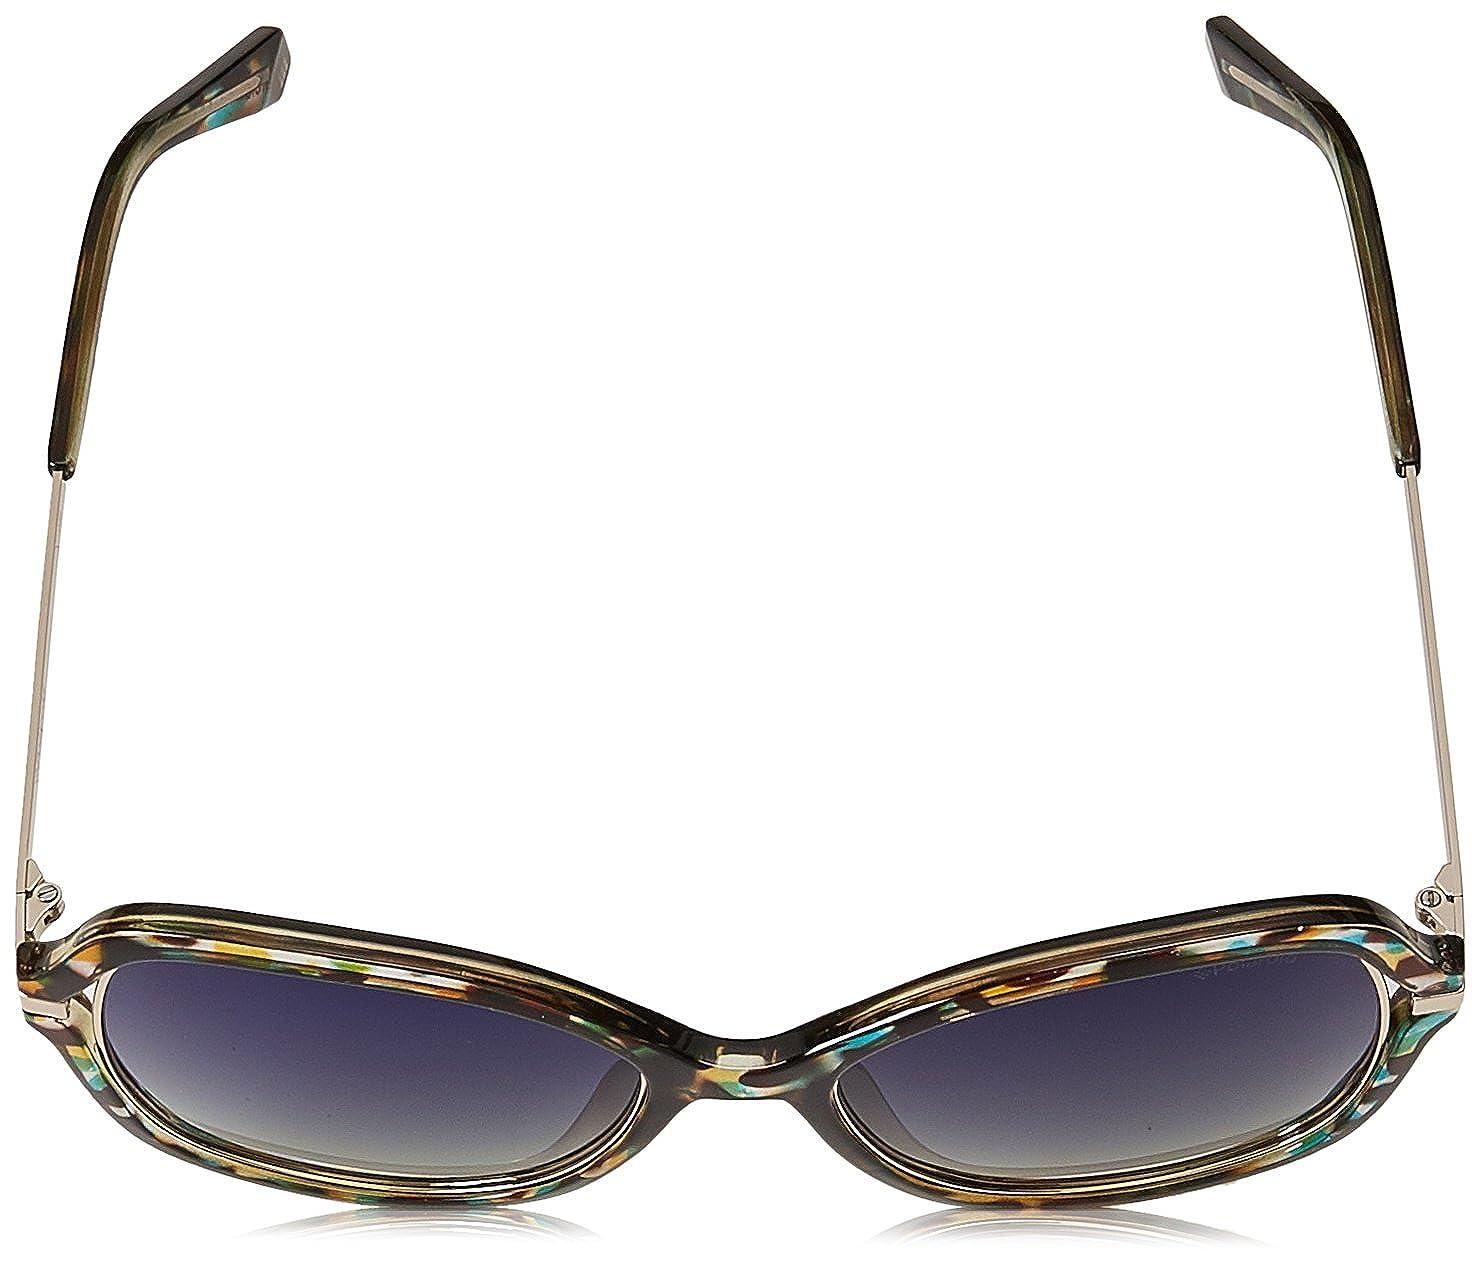 d8706043e6 Gafas de Sol Polaroid PLD 4068 S XGW (Z7)  Amazon.es  Ropa y accesorios